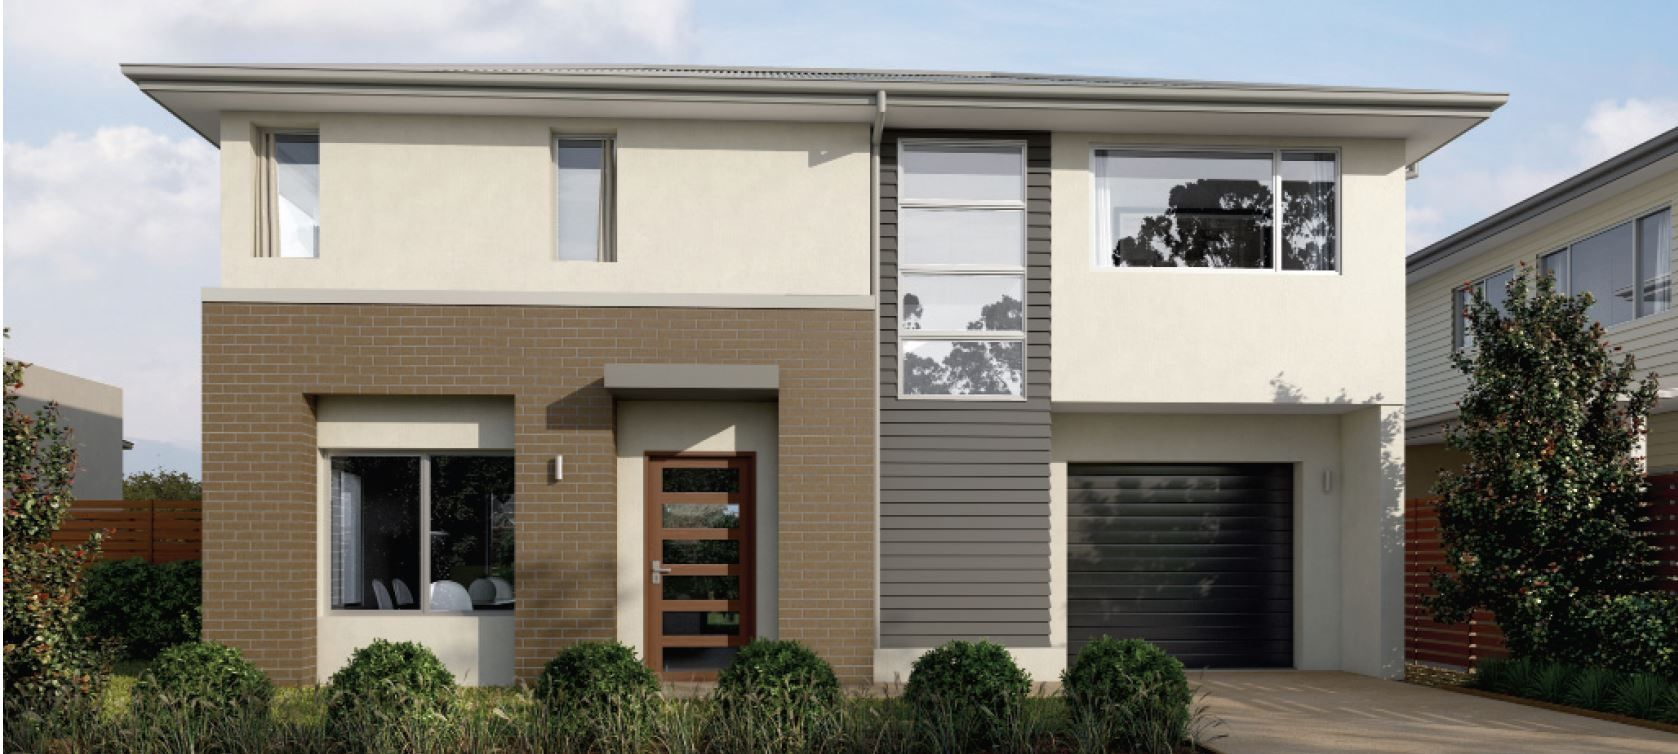 168 Holden Drive, Oran Park NSW 2570, Image 0